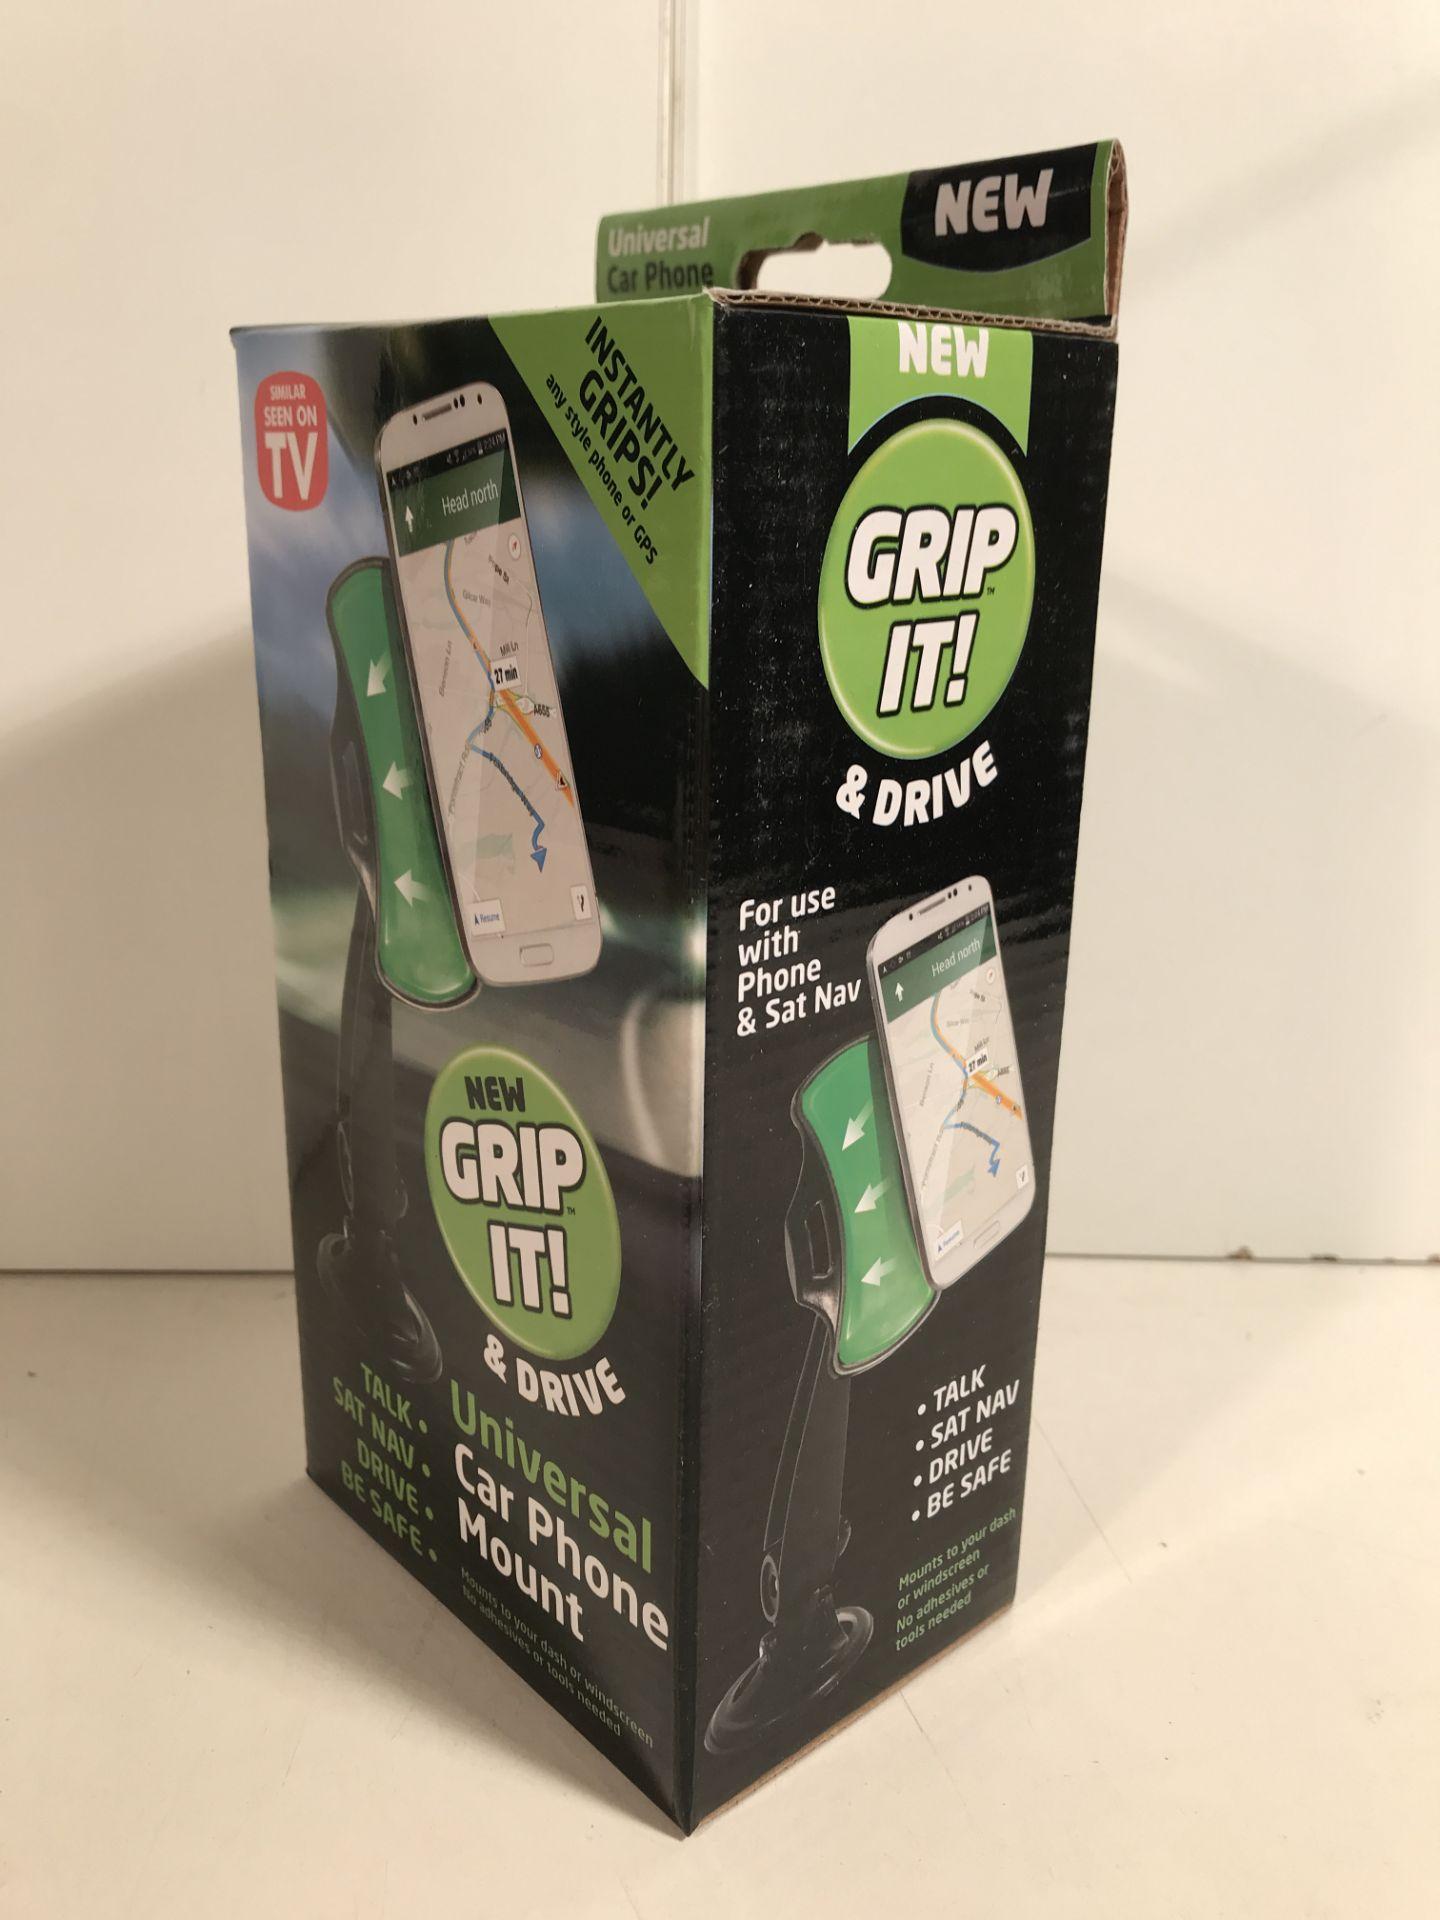 Lot 55 - 7 x GRIP IT! Universal Car Phone Mount